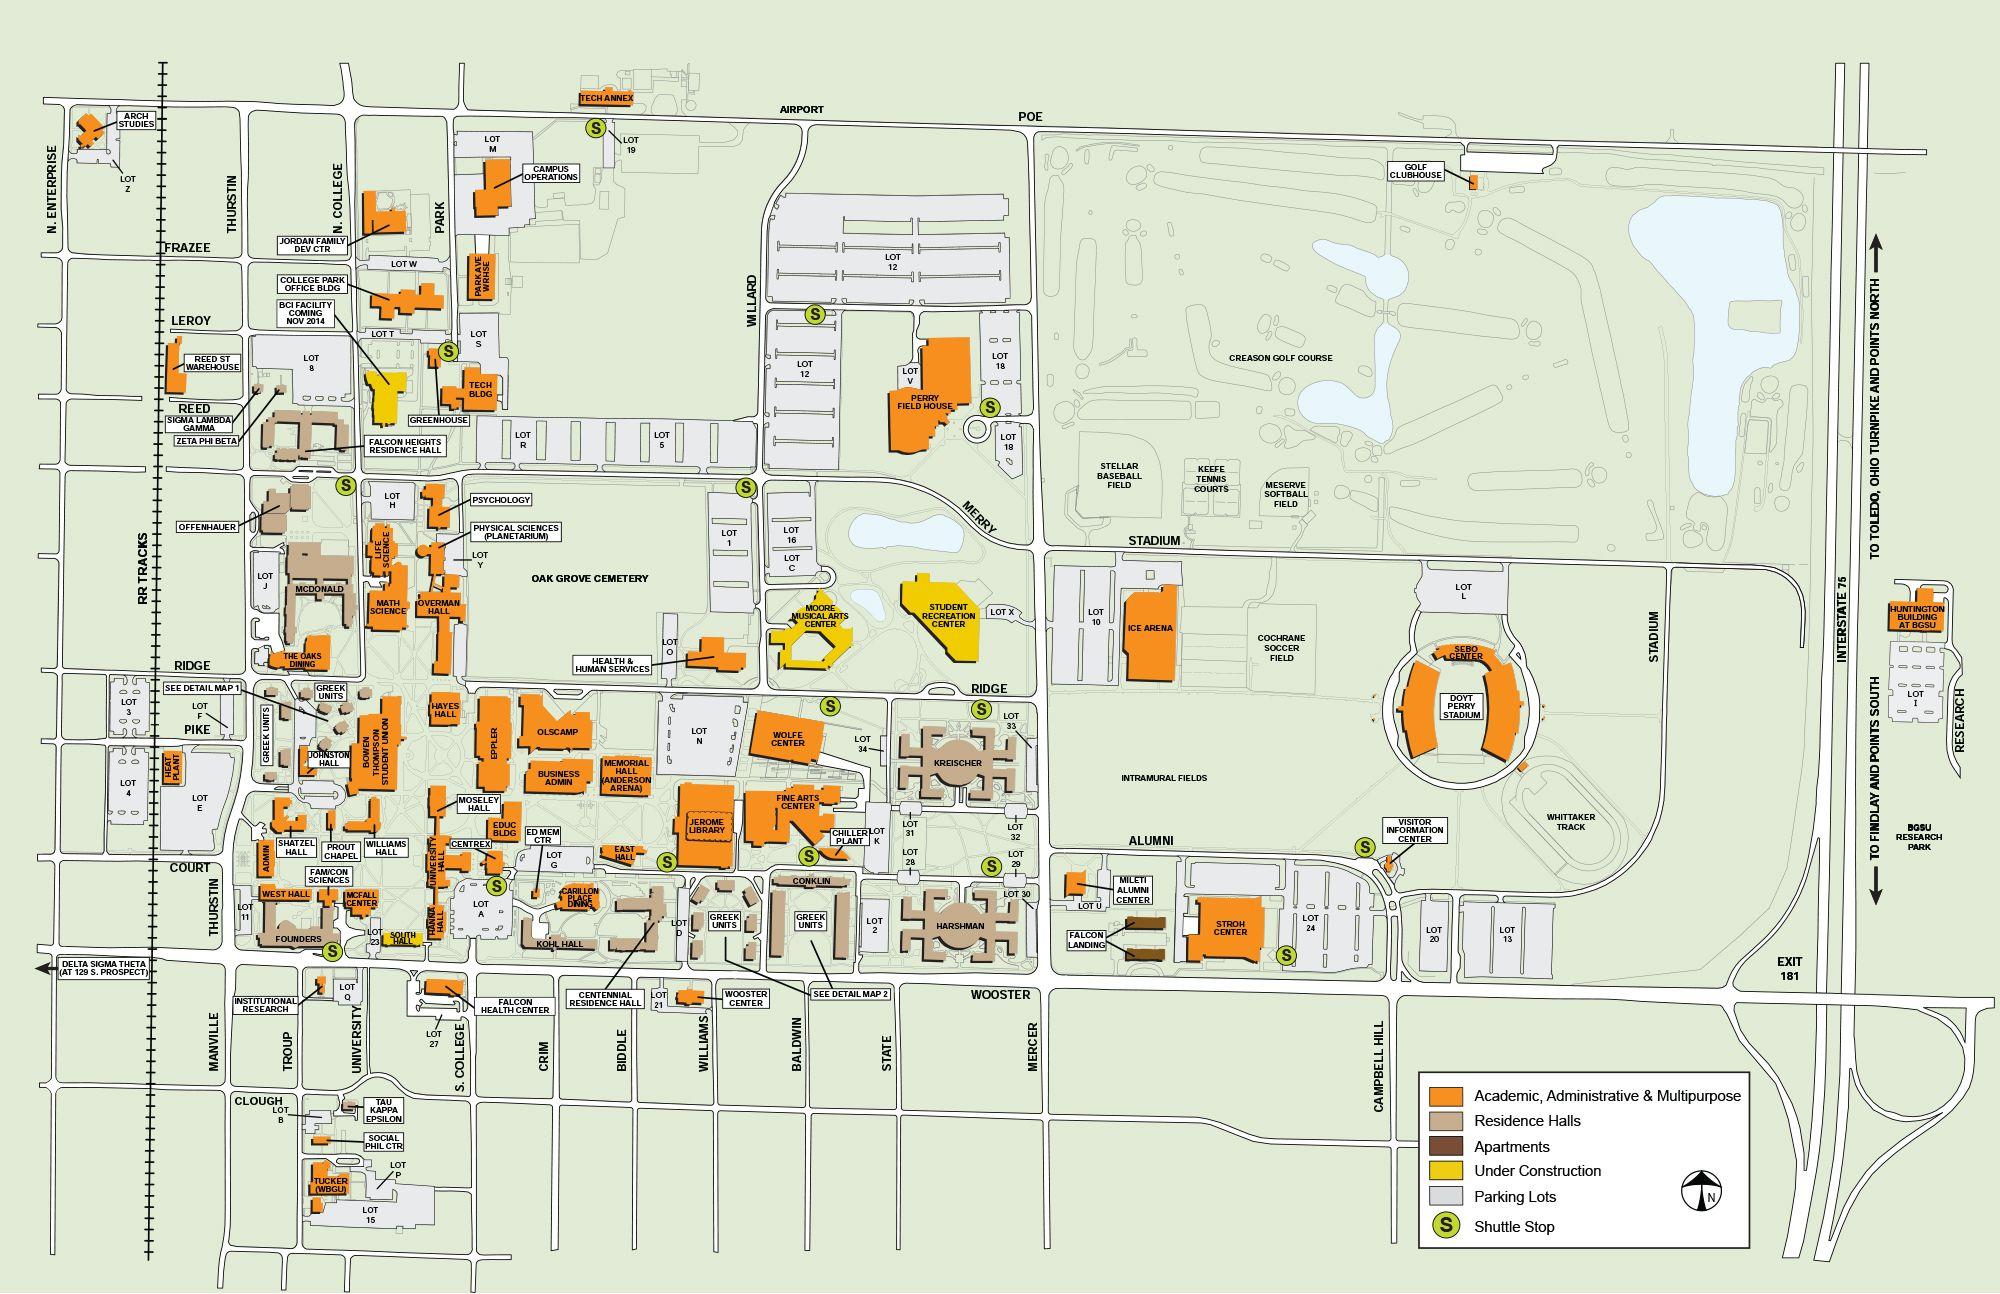 Bgsu Map Hoyuk Westernscandinavia Org